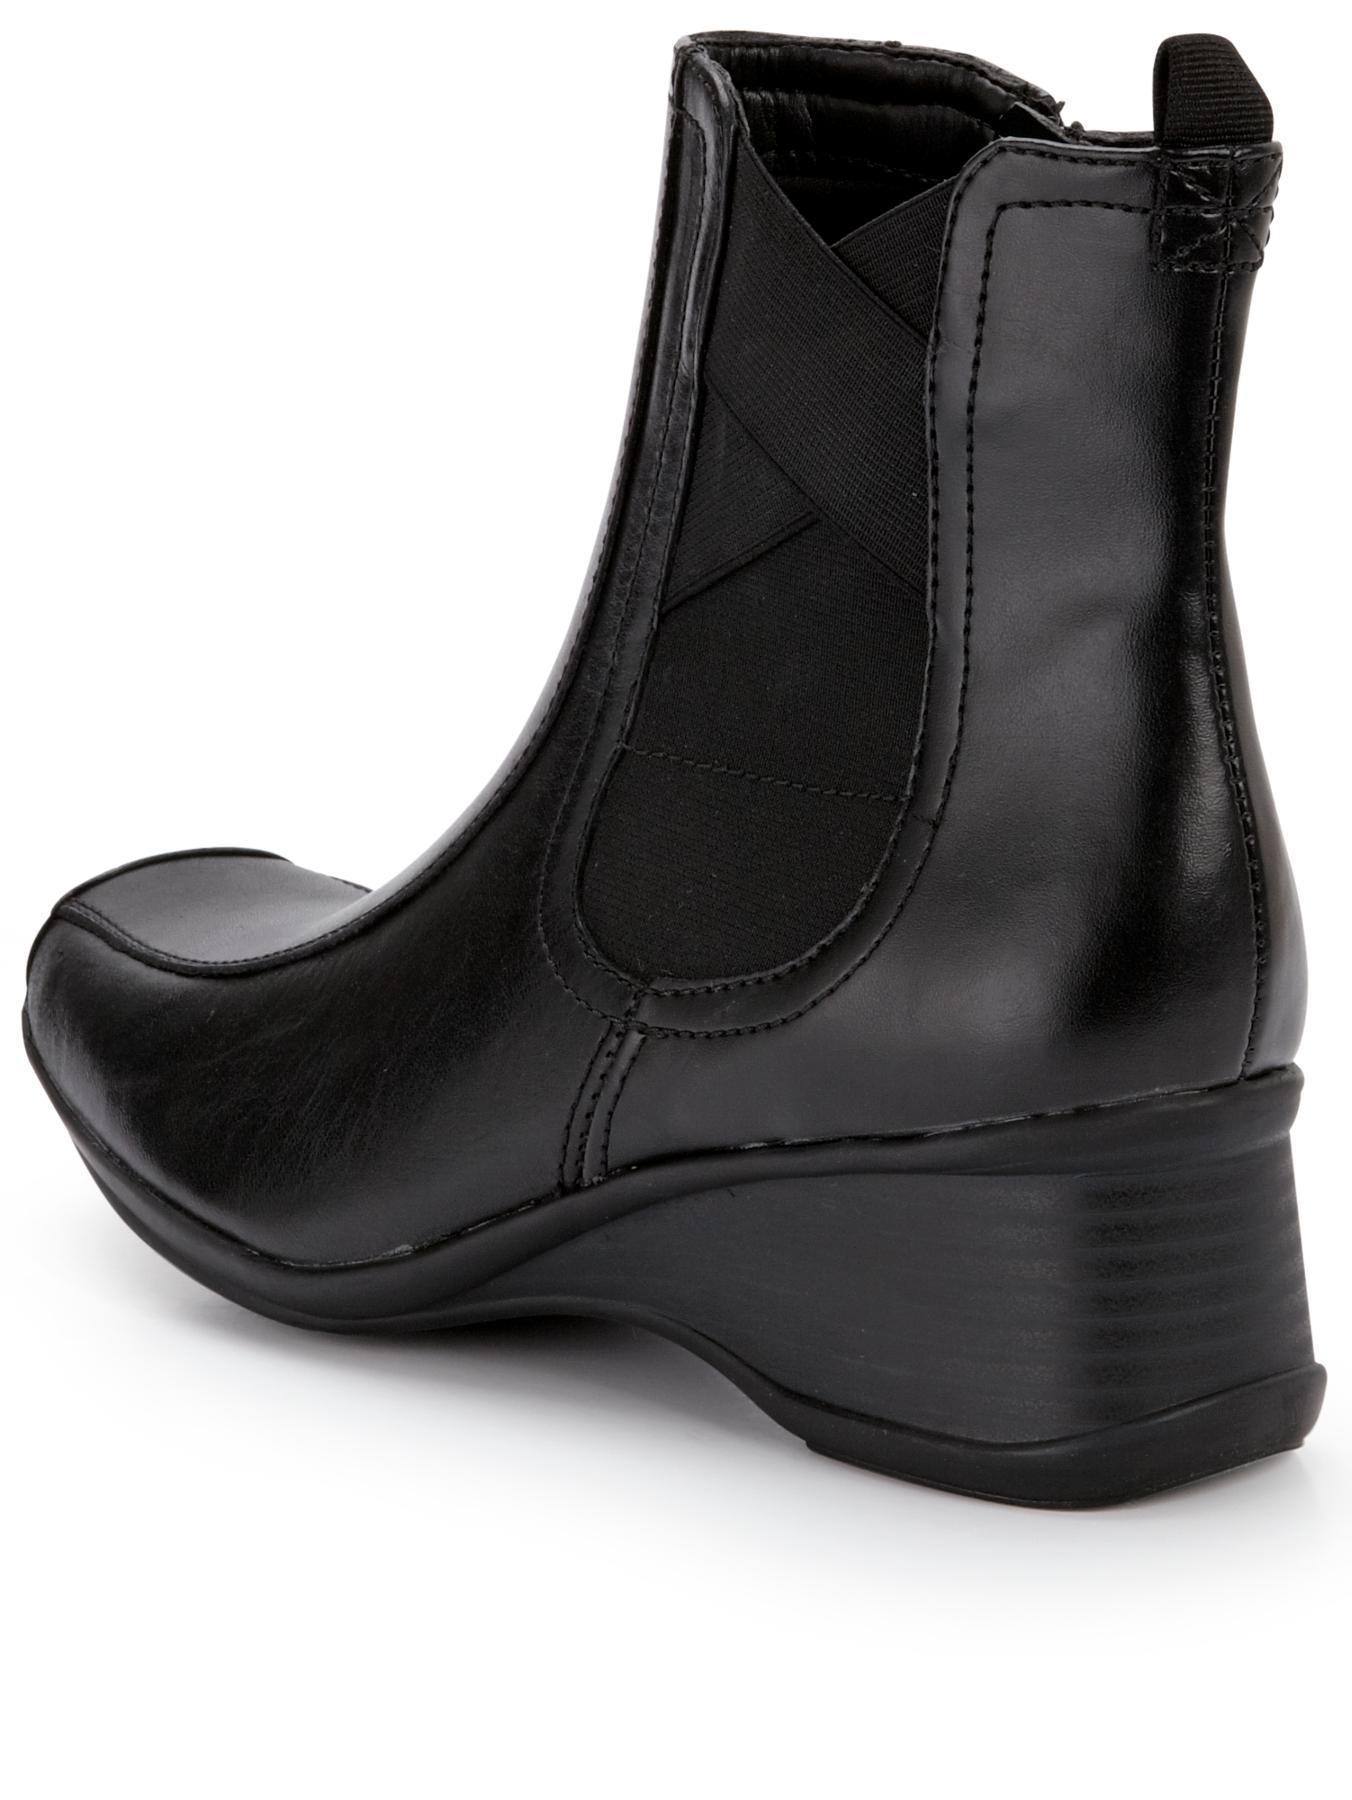 clarks clarks lisbon sky wedge ankle boots in black black